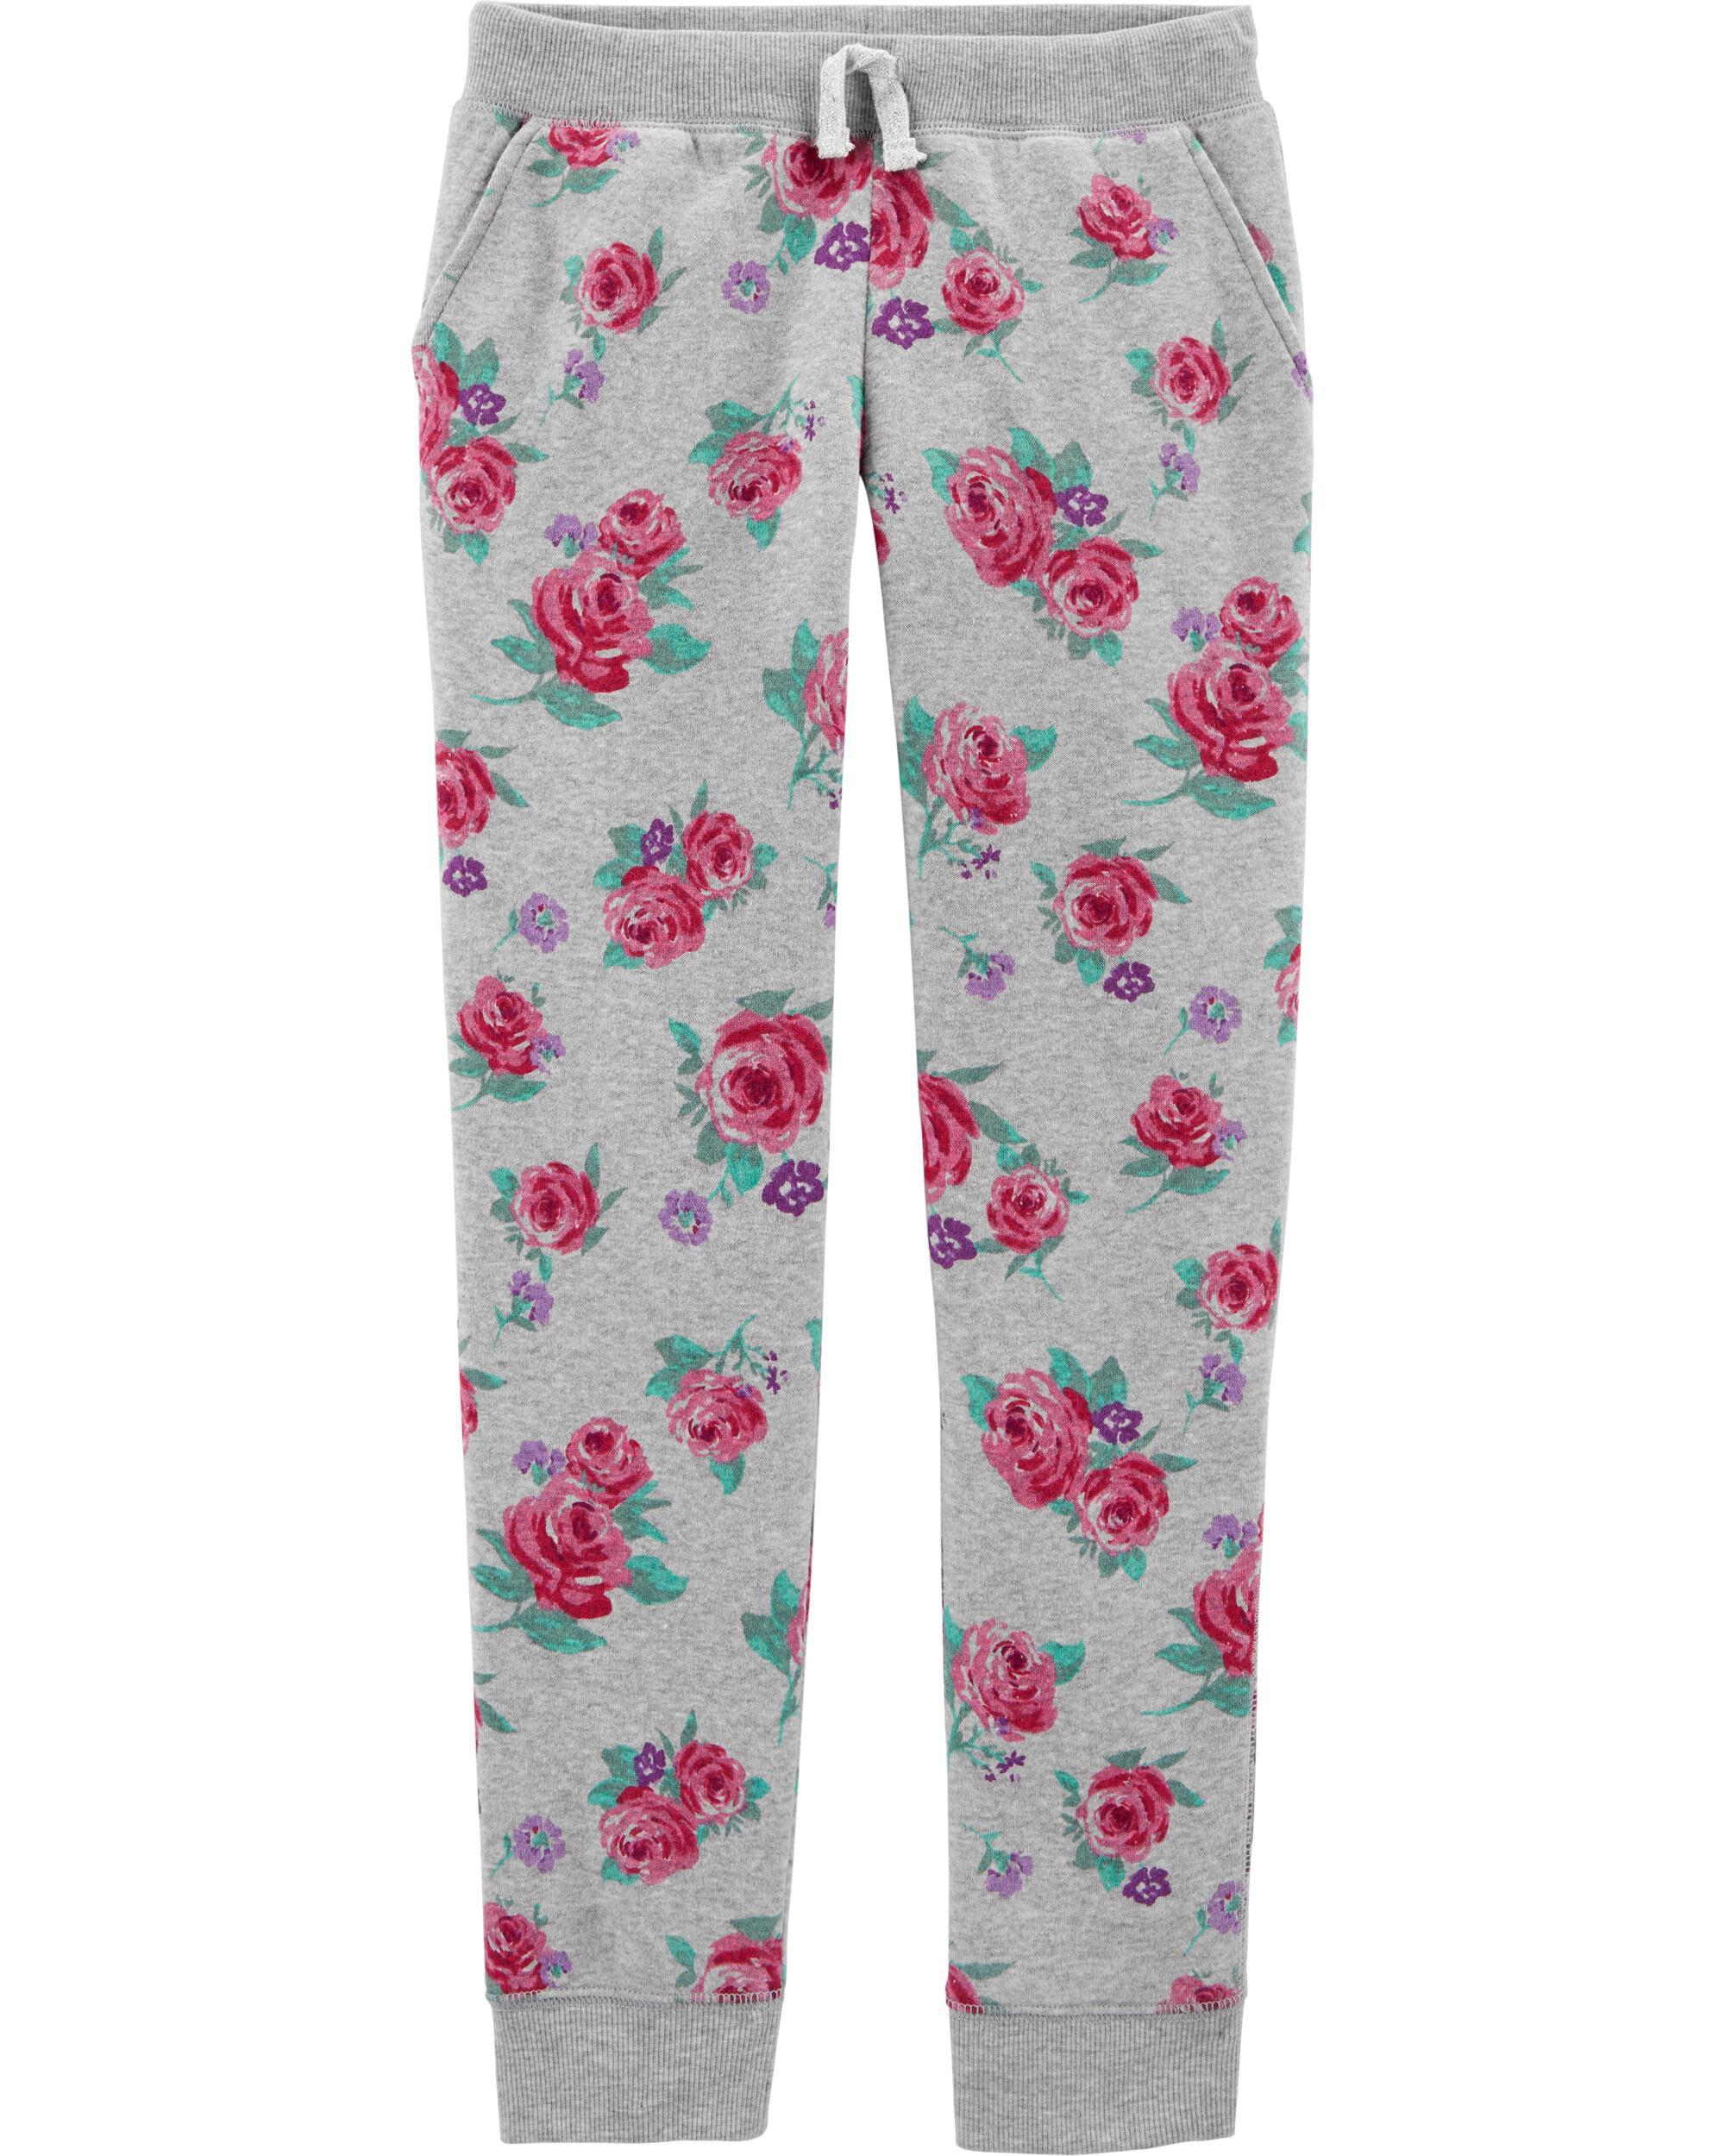 *CLEARANCE*Logo Fleece Floral Pants